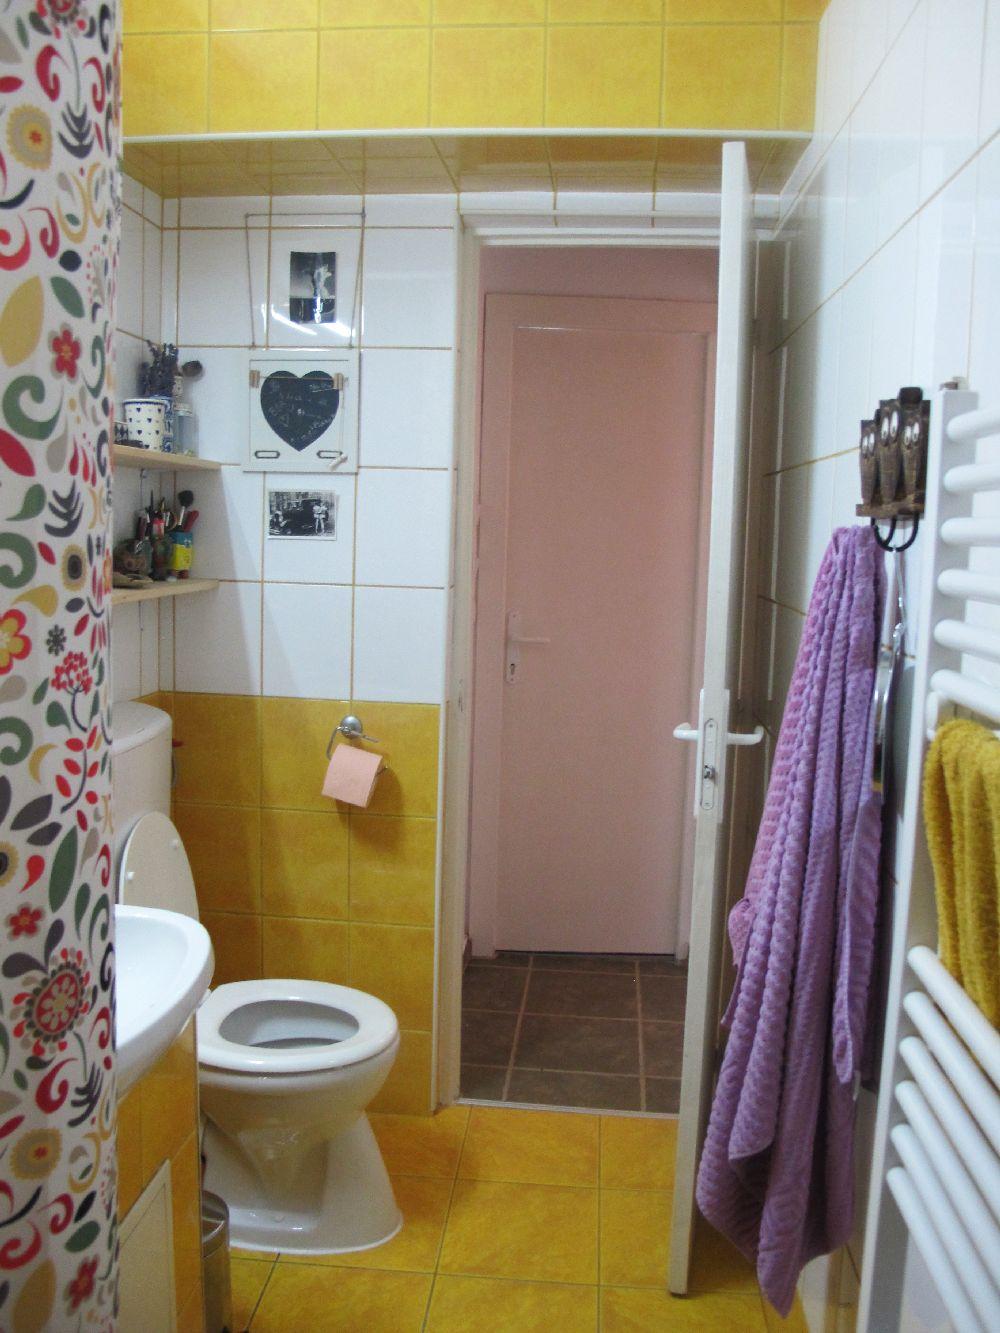 adelaparvu.com despre apartament 3 camere colorat in Sibiu, Foto Adela Parvu (89)